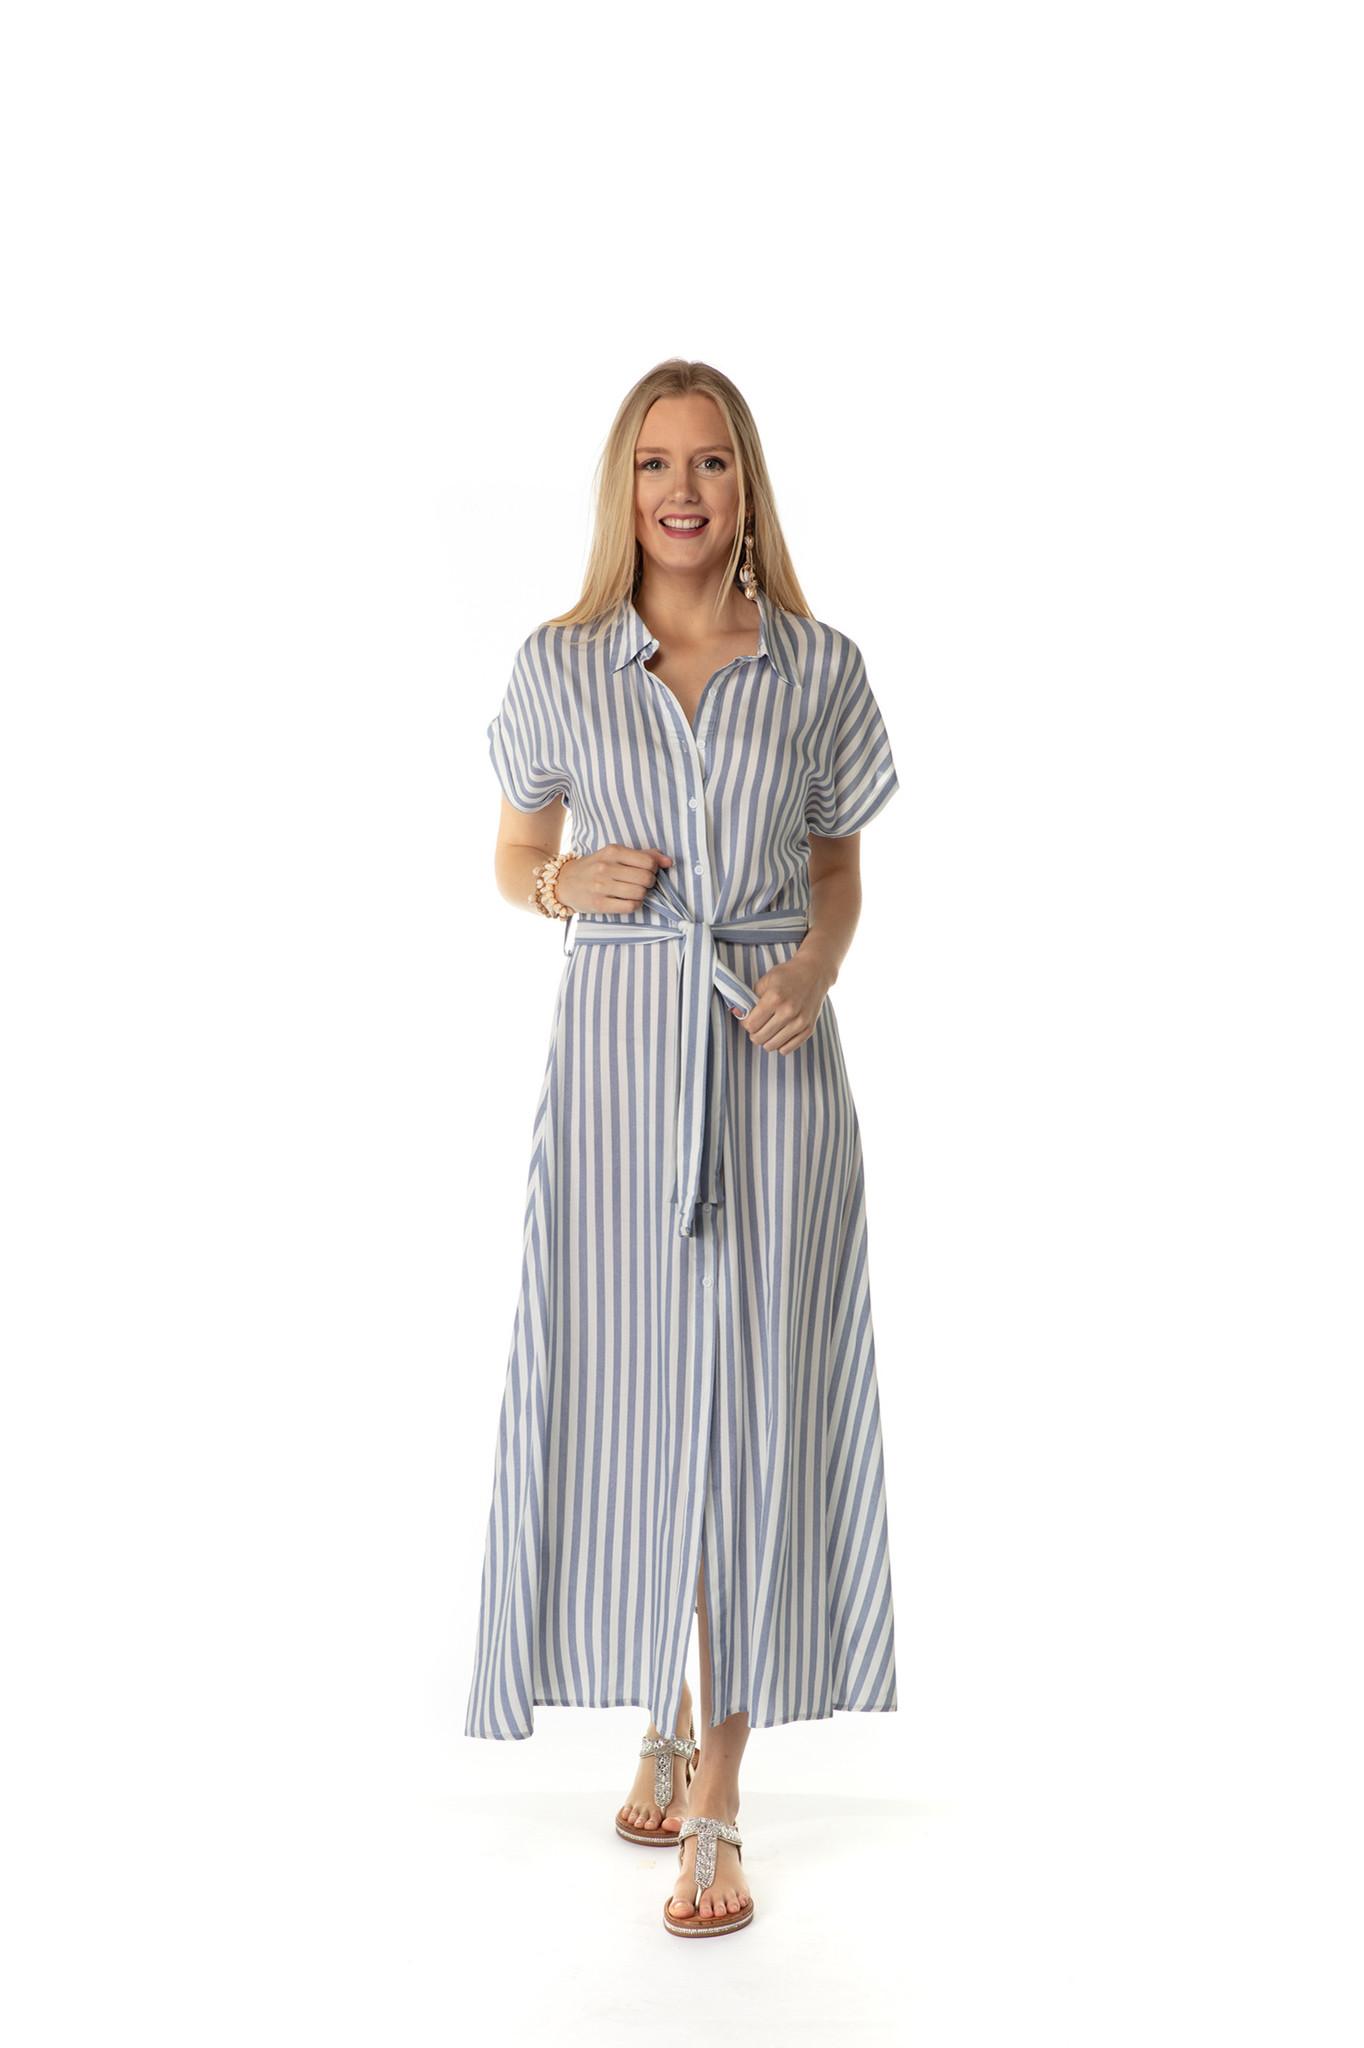 200ROB0210 Hemd jurk maxi gestreept kap mouw Licht blauw